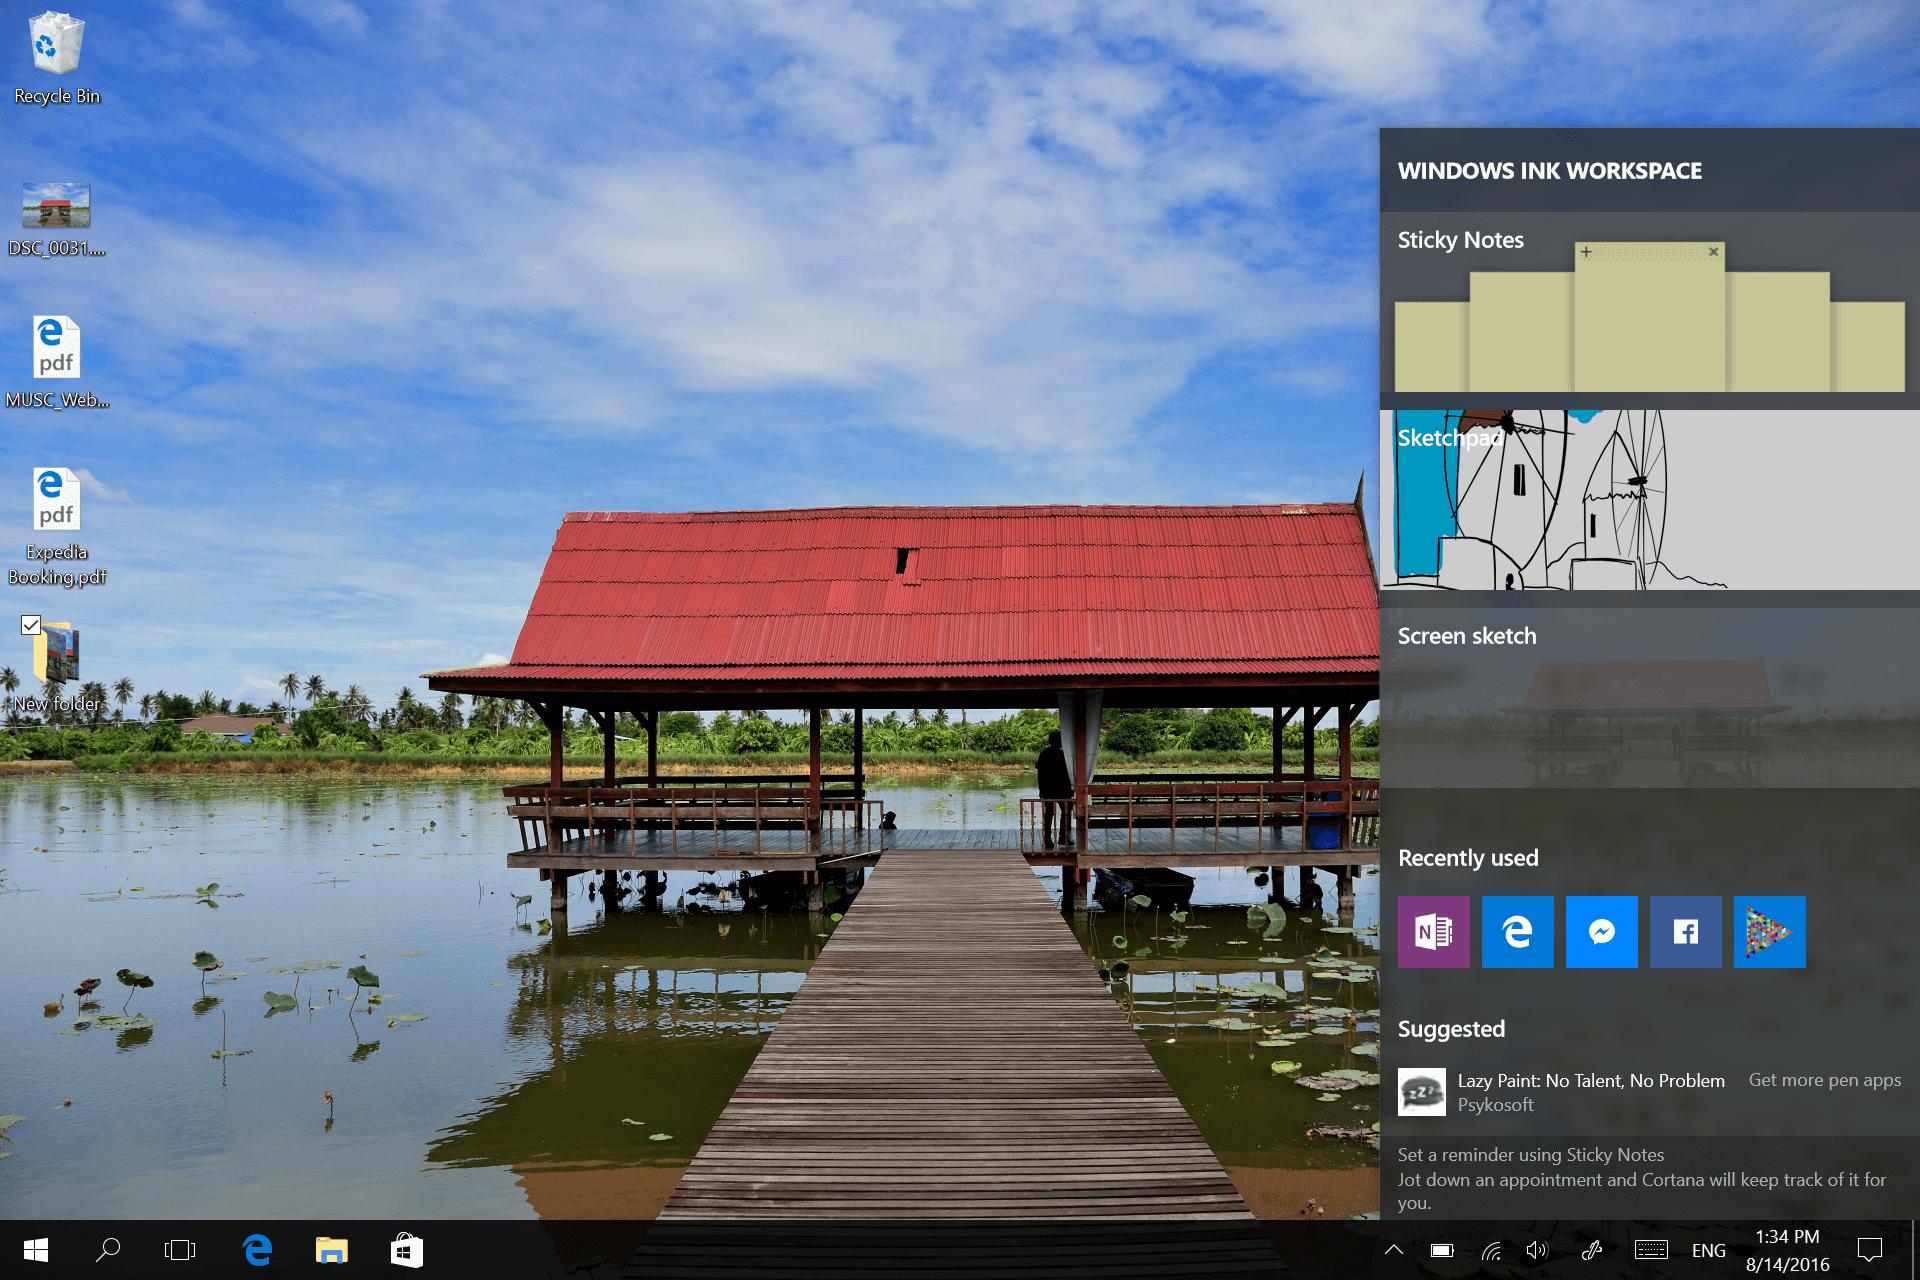 Windows10_anniversary_update_windows_ink_space